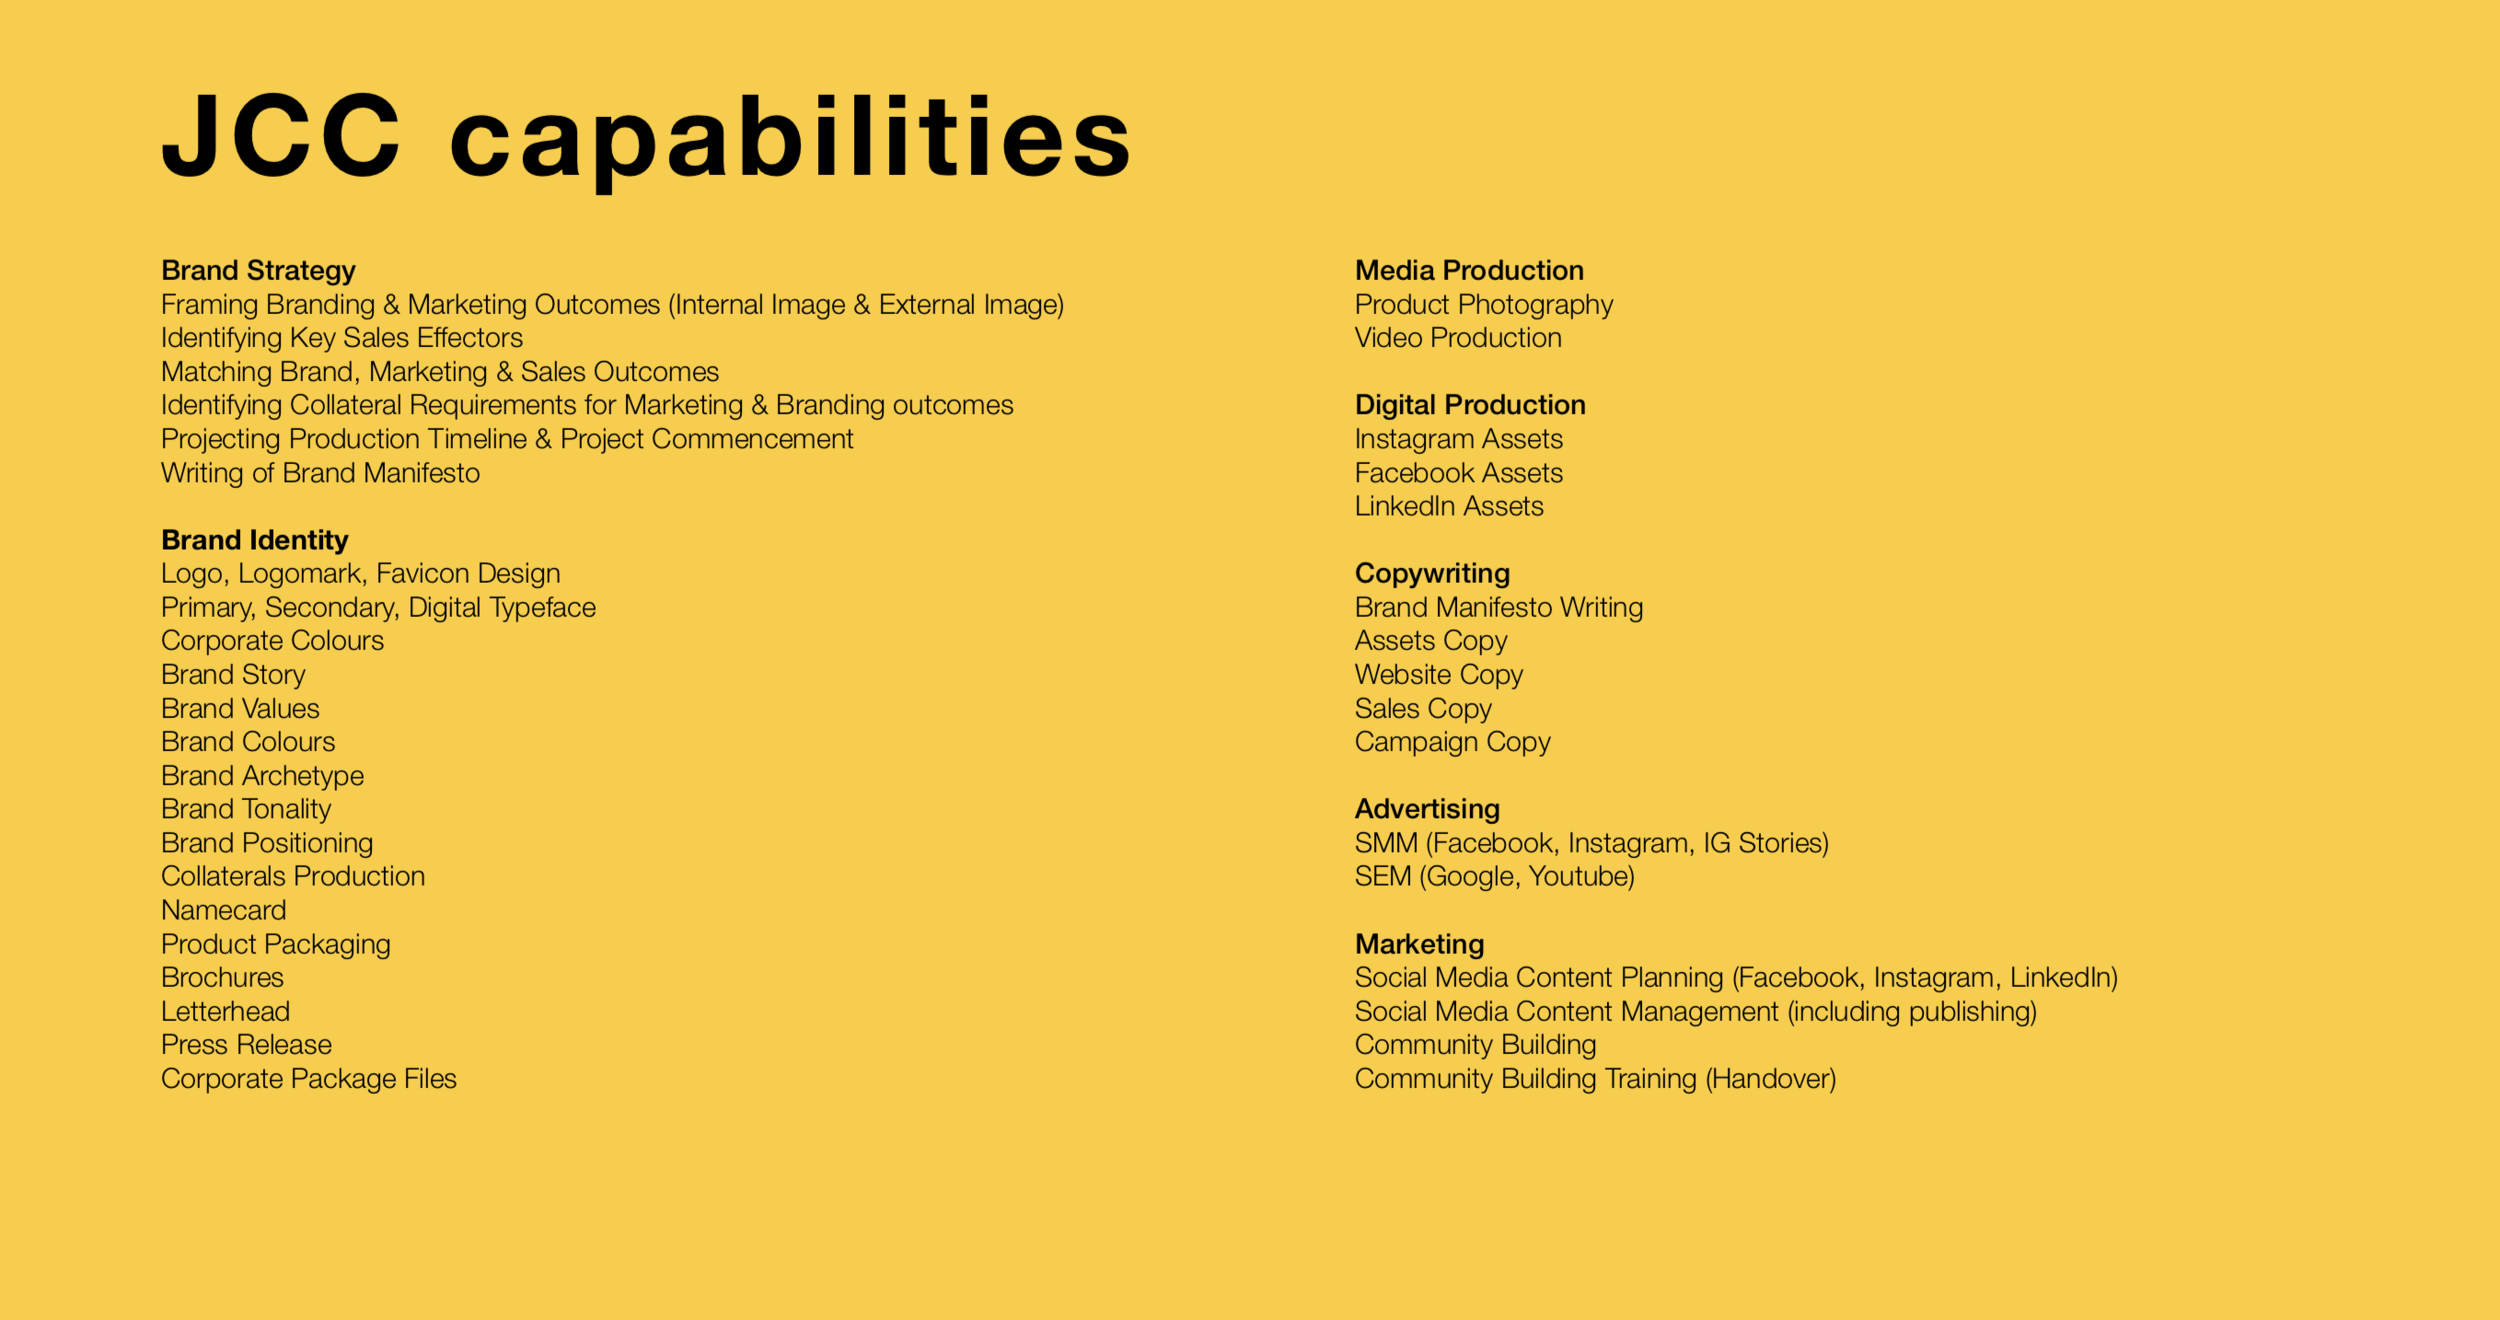 JCC Capabilities.png